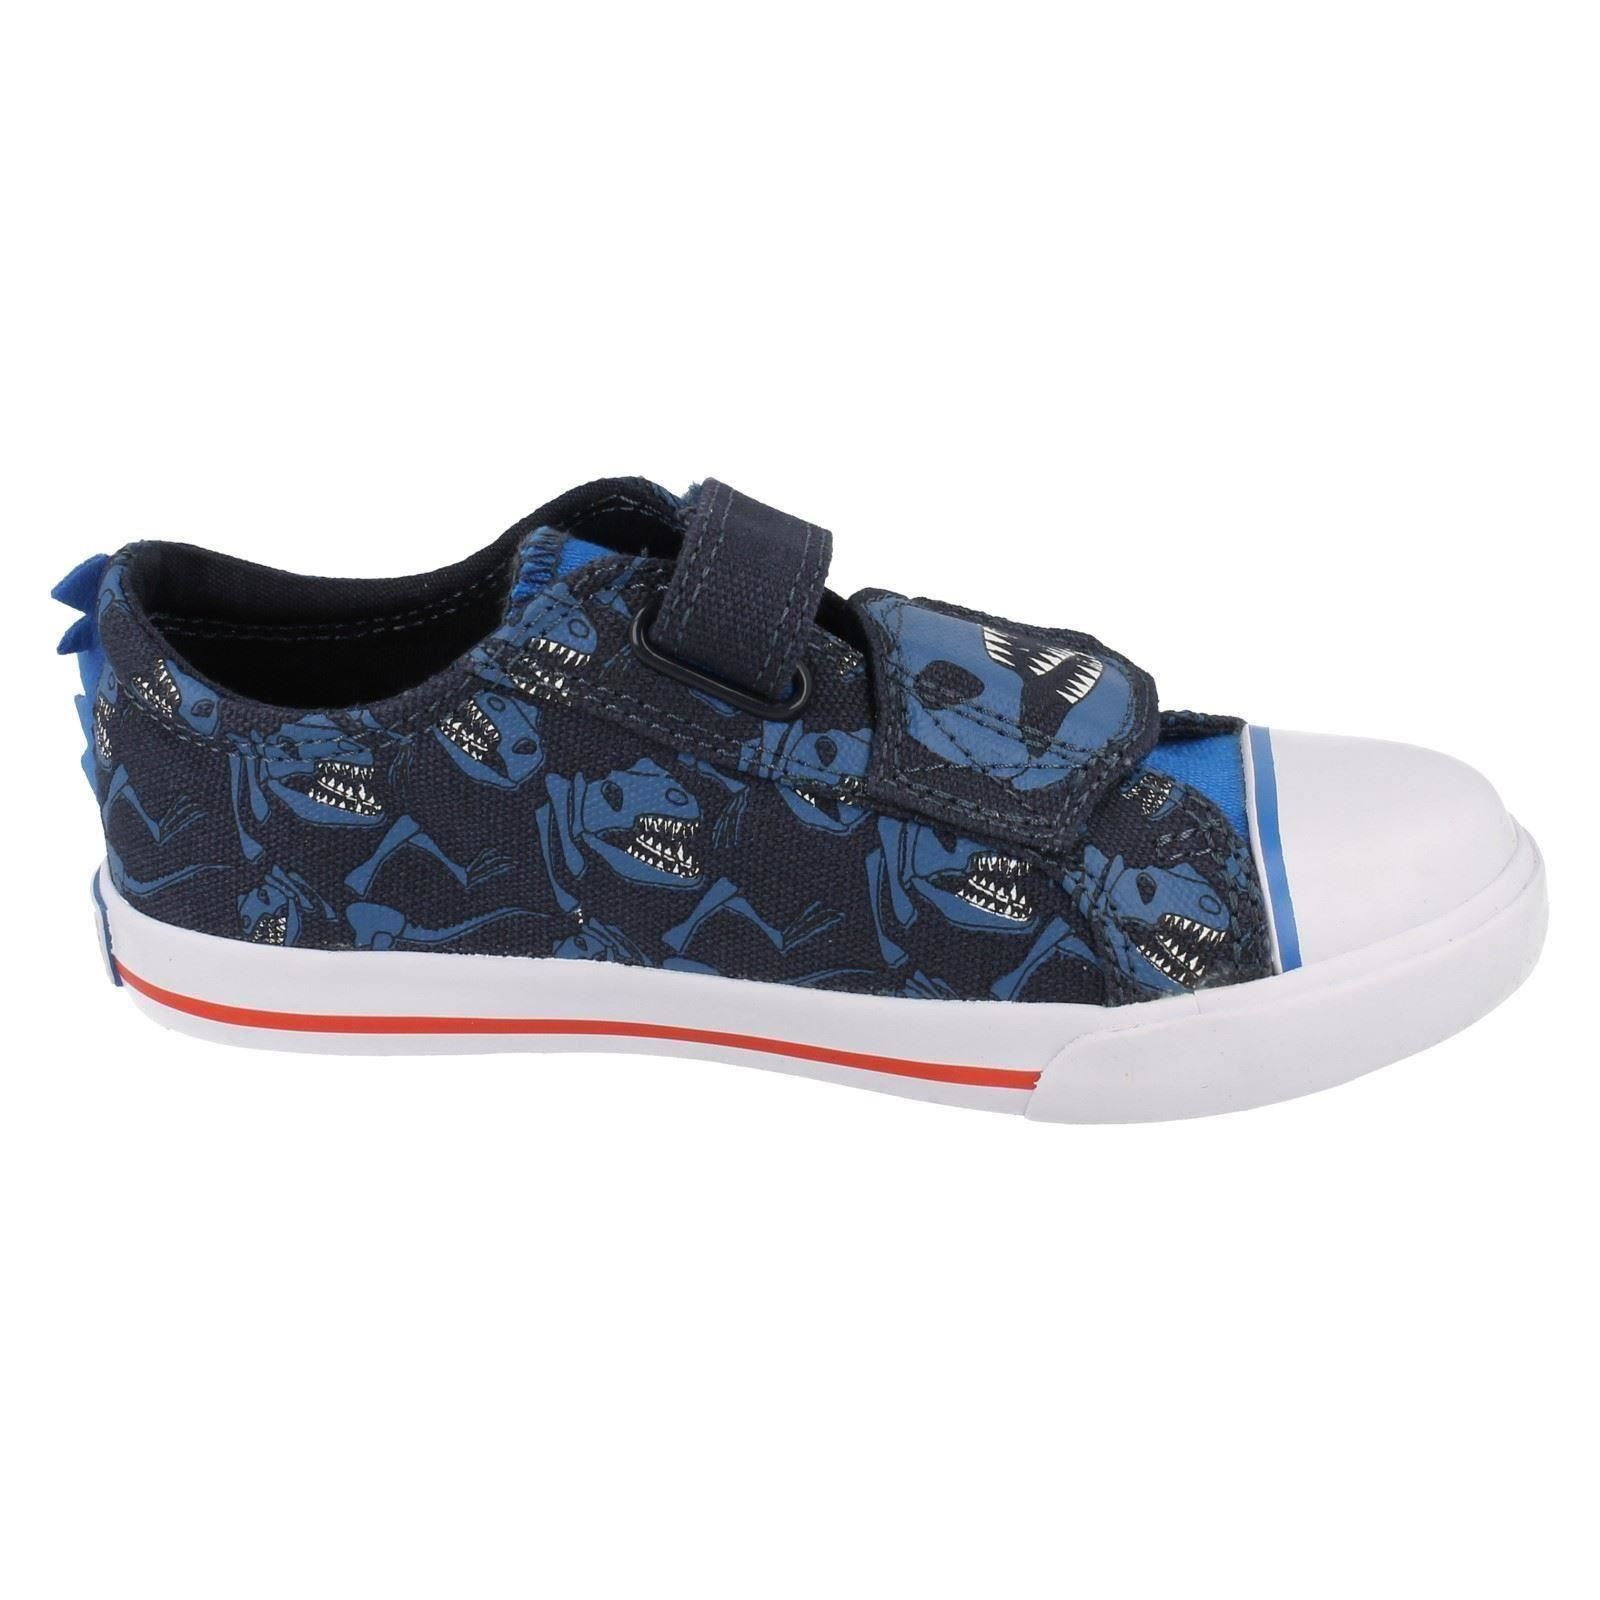 Boys Clarks Shoes Tricer Roar